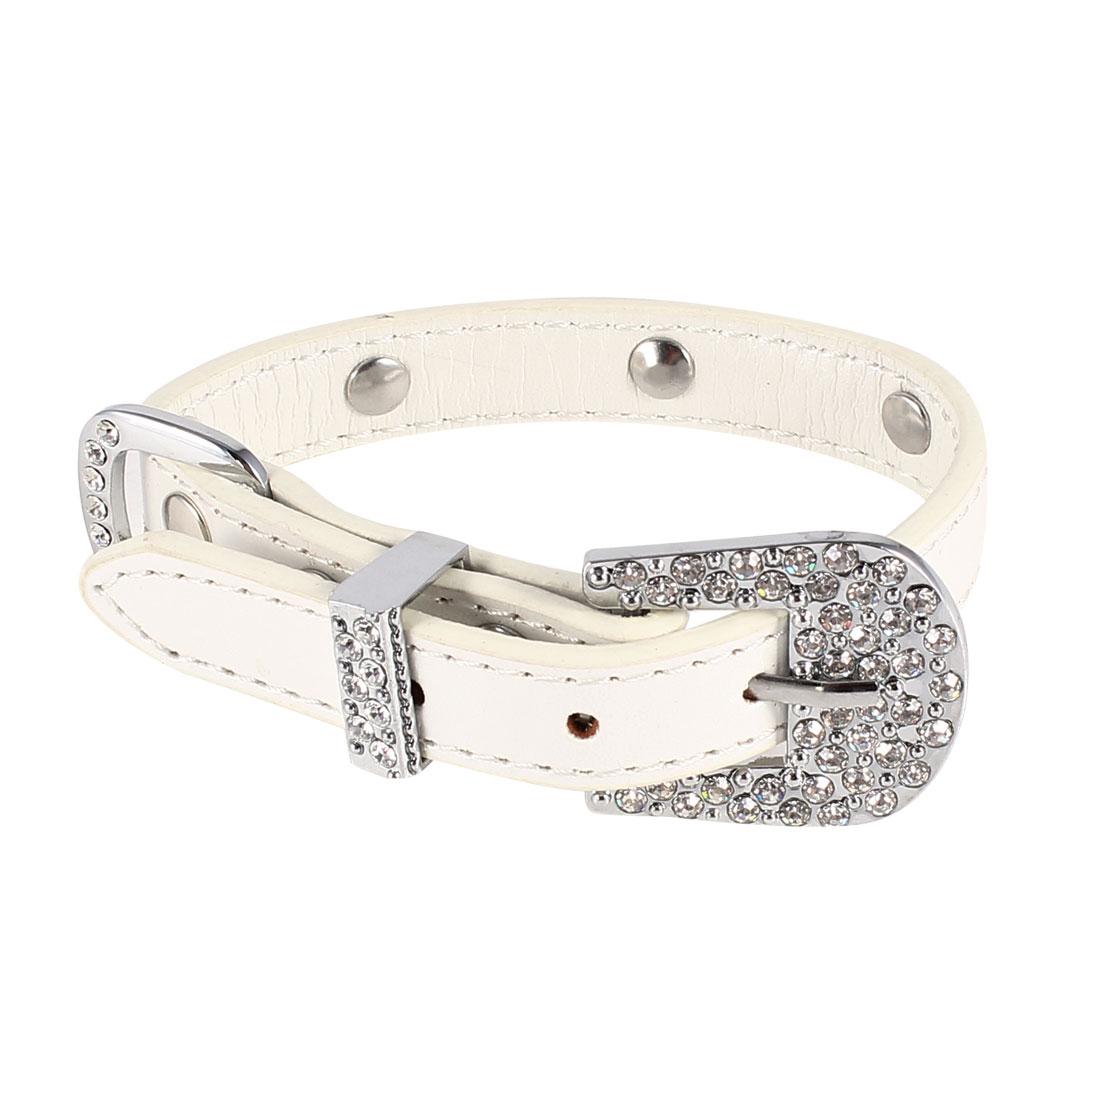 Pet Dog Cat White Rhinestone Detail Single Pin Buckle Collar Rope 31cm Long